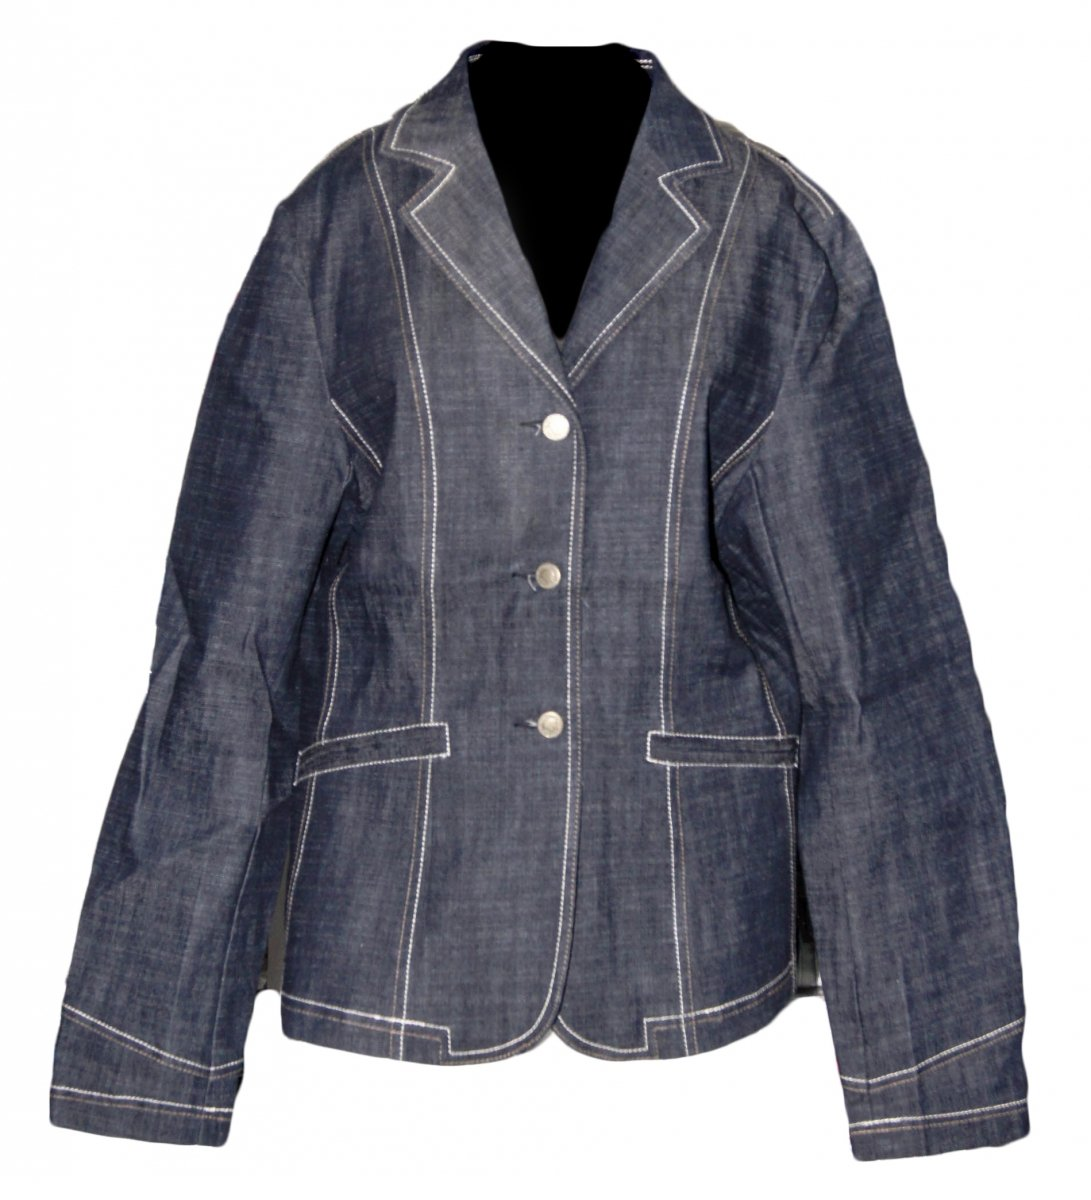 c33ea5847bd75 Marynarka jeansowa damska - Jacson